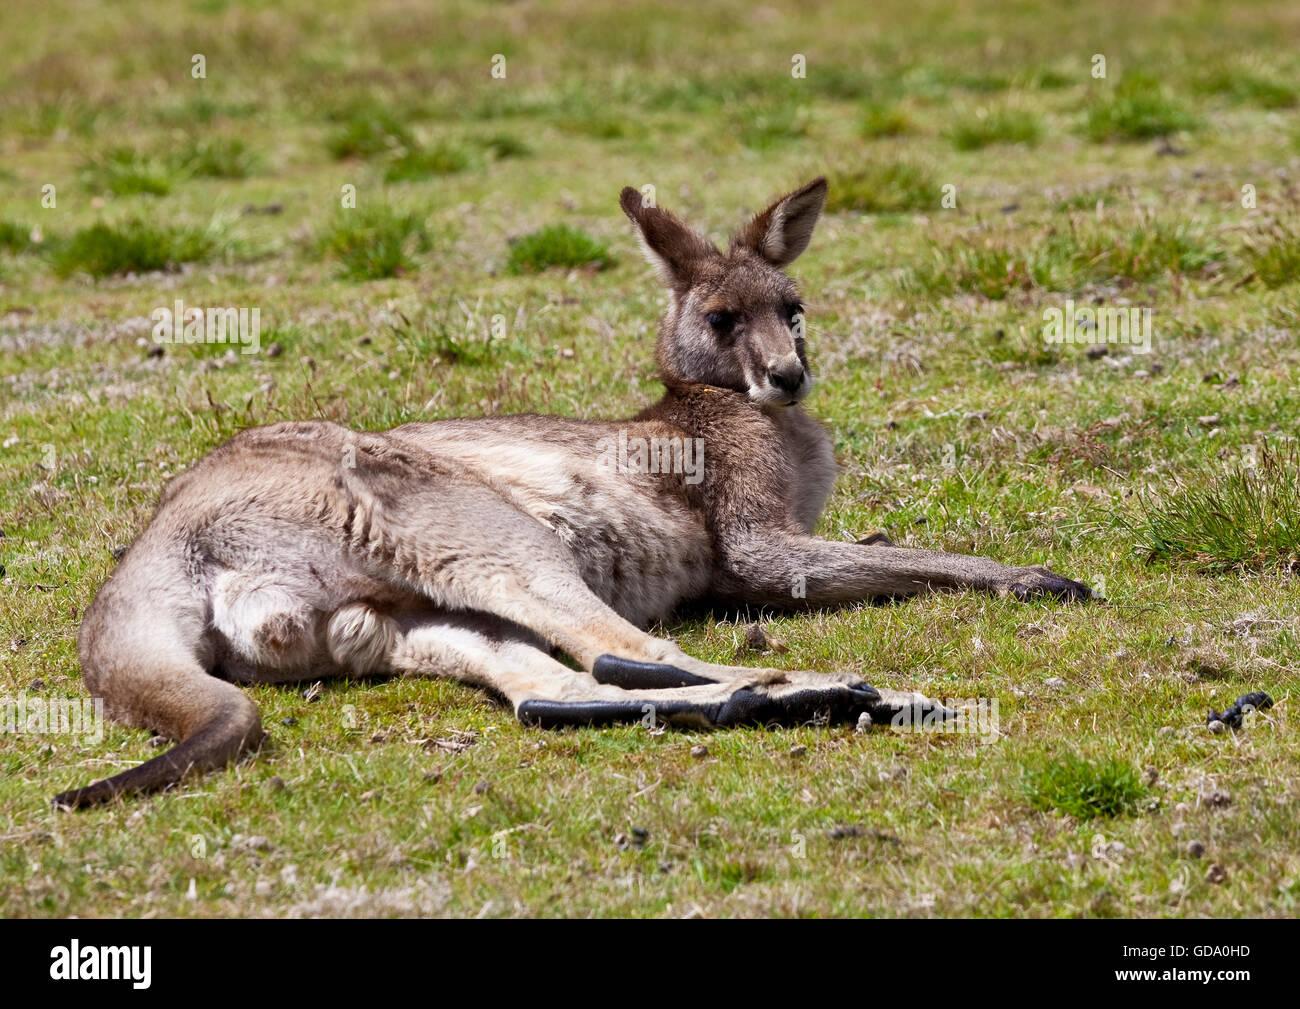 Male kangaroo lying on grass - Stock Image